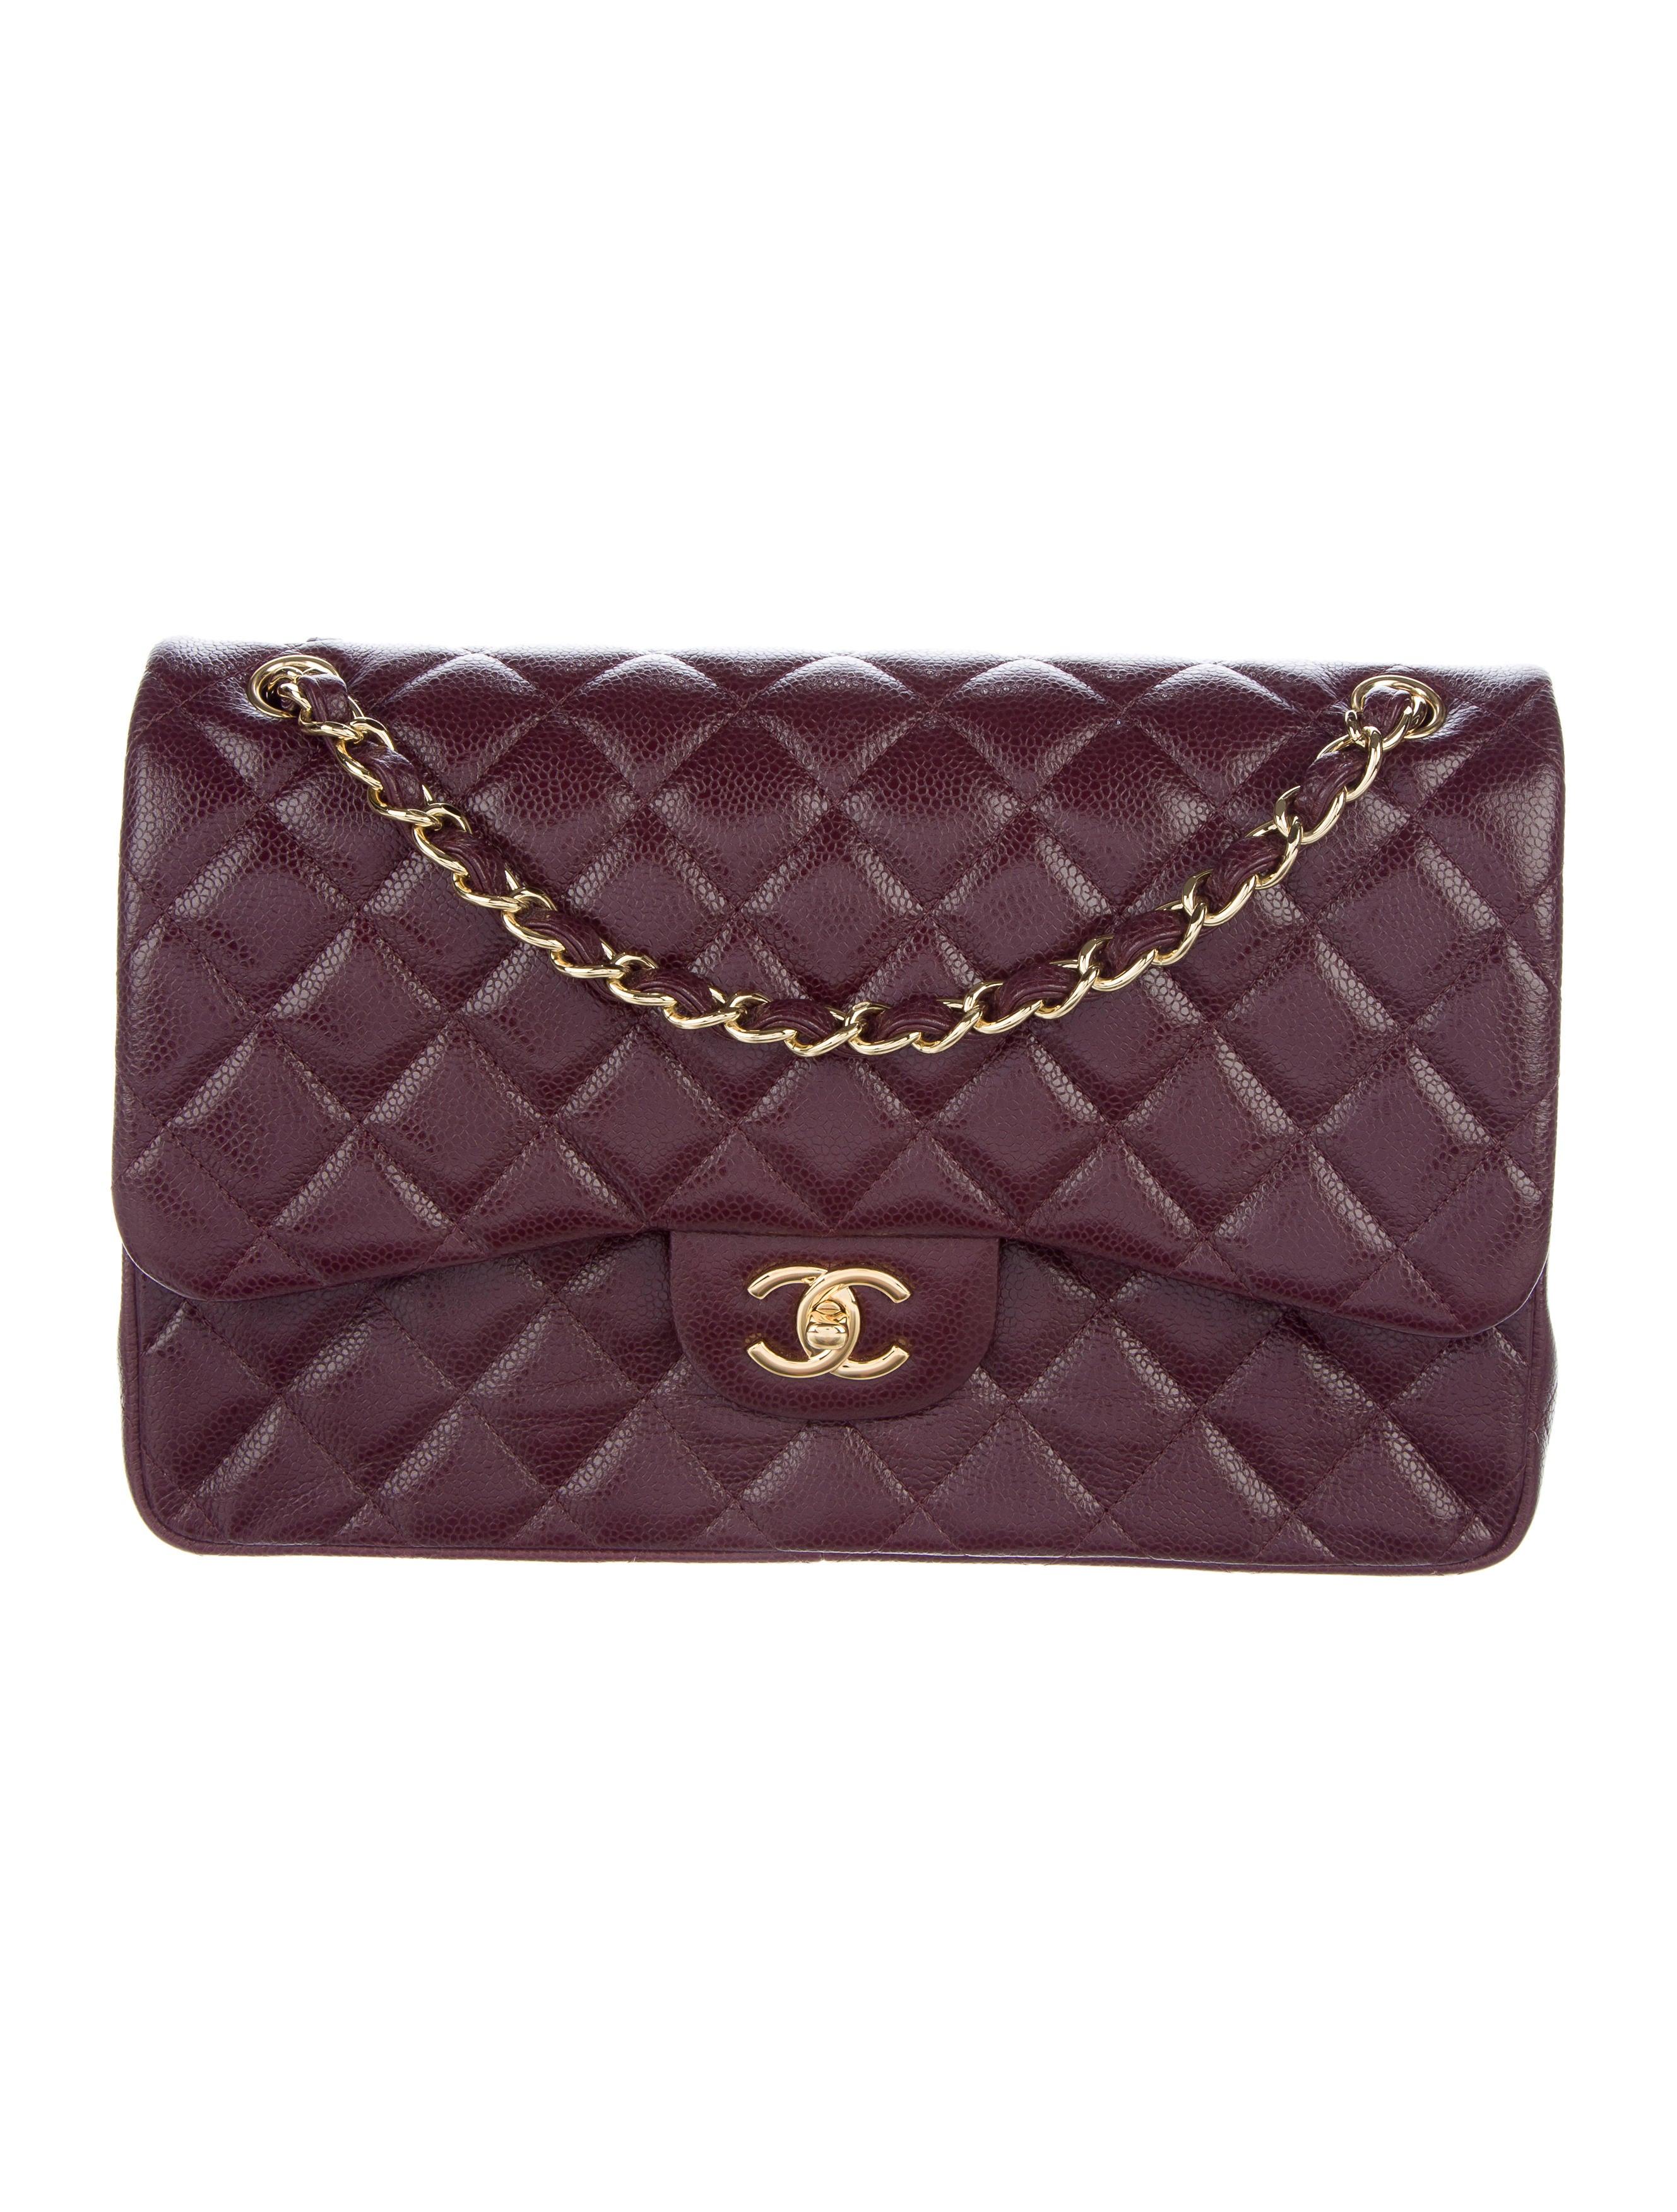 chanel caviar classic jumbo flap bag handbags